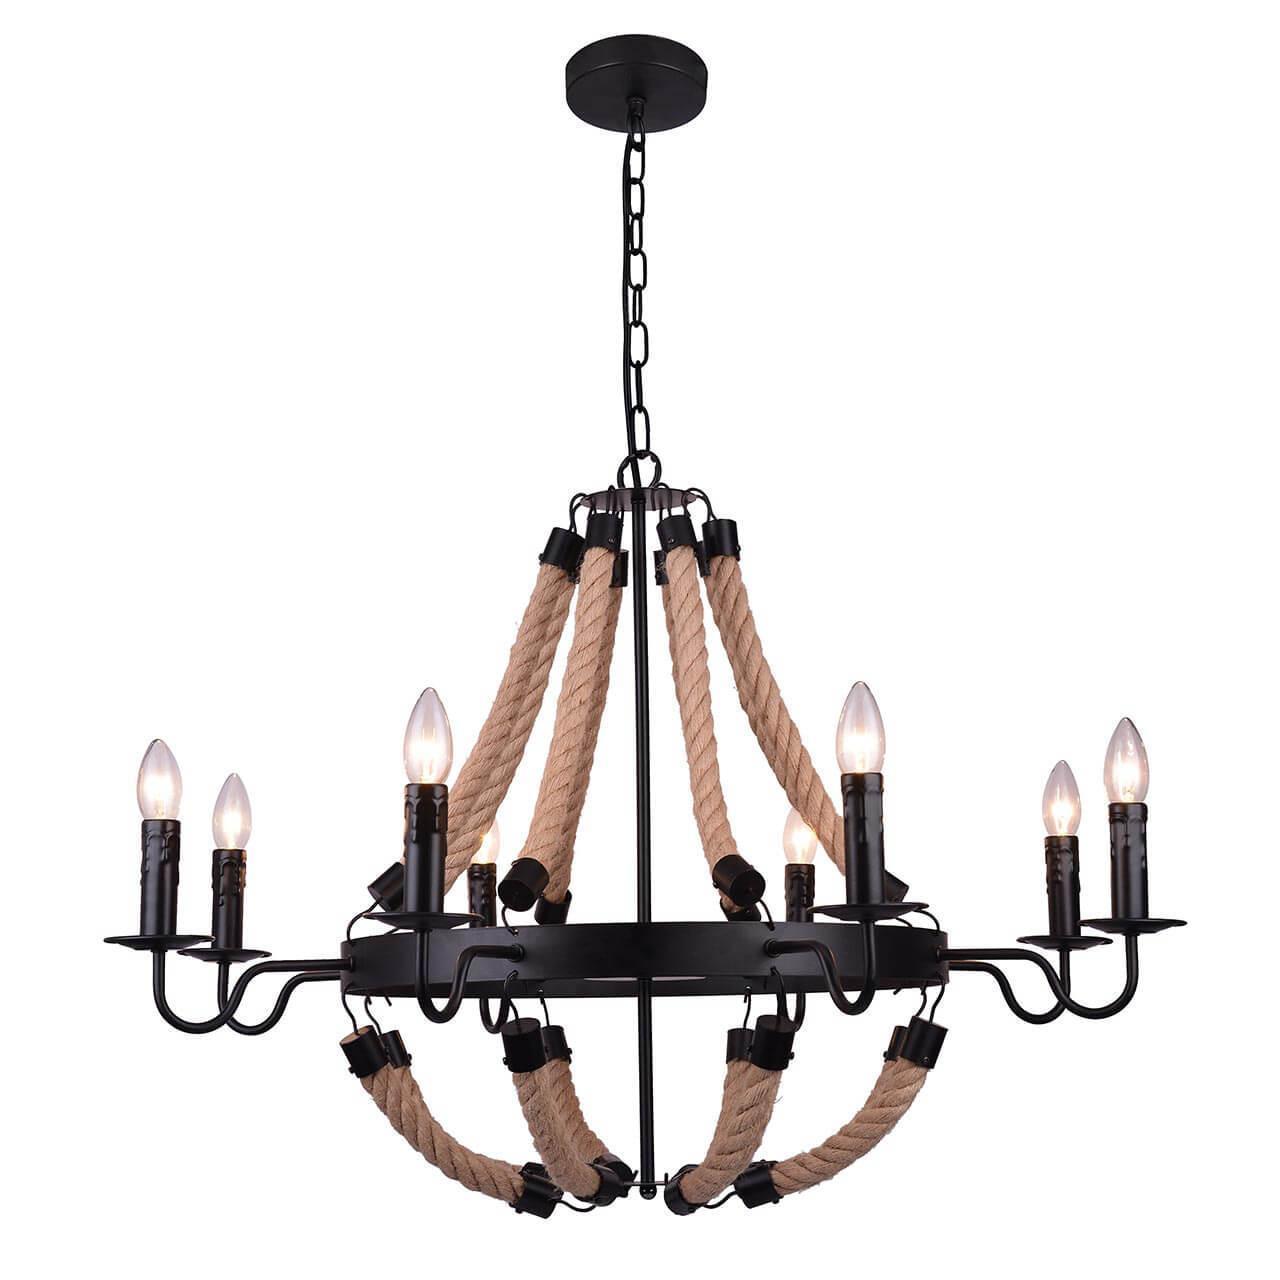 Подвесной светильник Arte Lamp A8956LM-8BK, E14, 40 Вт arte lamp люстра arte lamp a6586lm 8bk